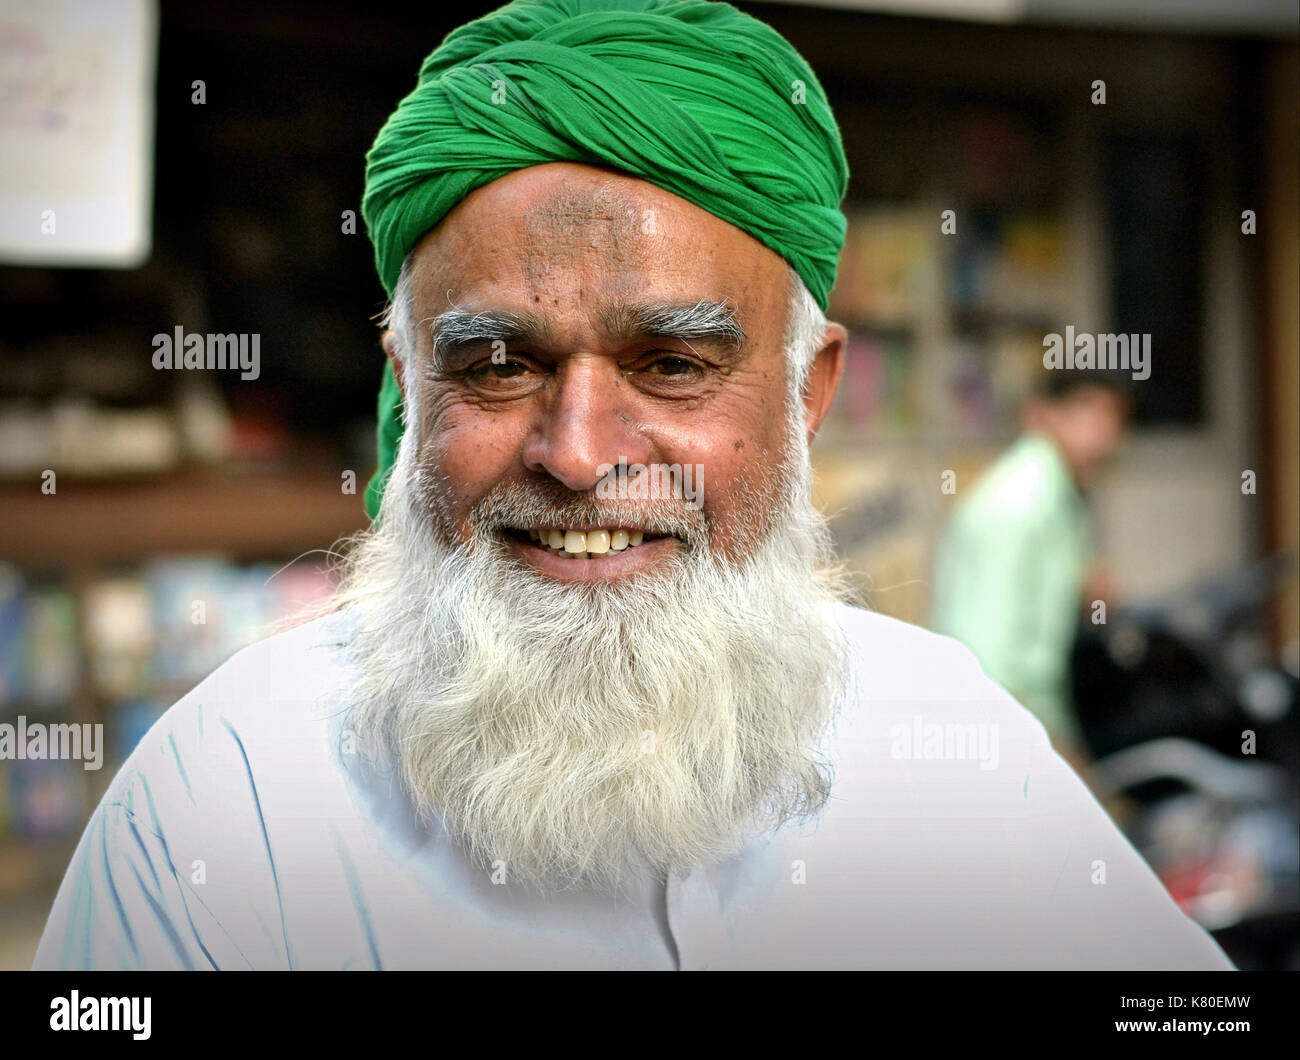 Smiling, elderly Indian Muslim man with white Muslim full-beard and distinctive Muslim prayer bump (zebibah) on his forehead, wearing a green turban - Stock Image